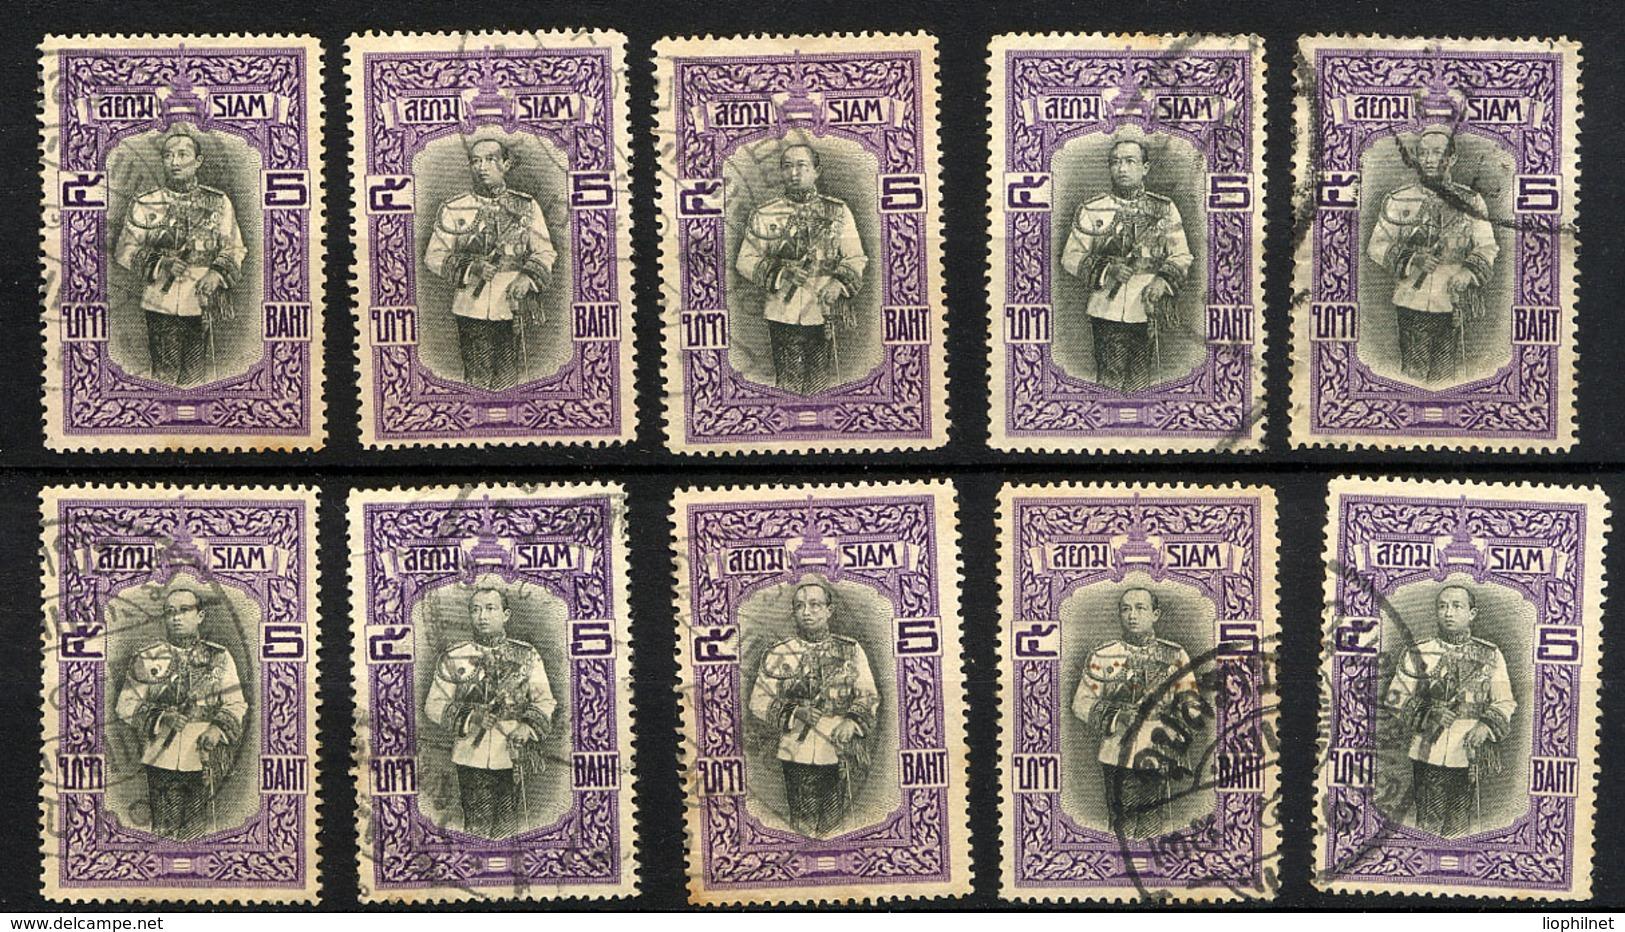 SIAM THAILAND 1912, Yvert 111, Roi Vajiravudh, 1 Valeur X 10 Exemplaires, Oblitérés / Used. R1627b - Thaïlande